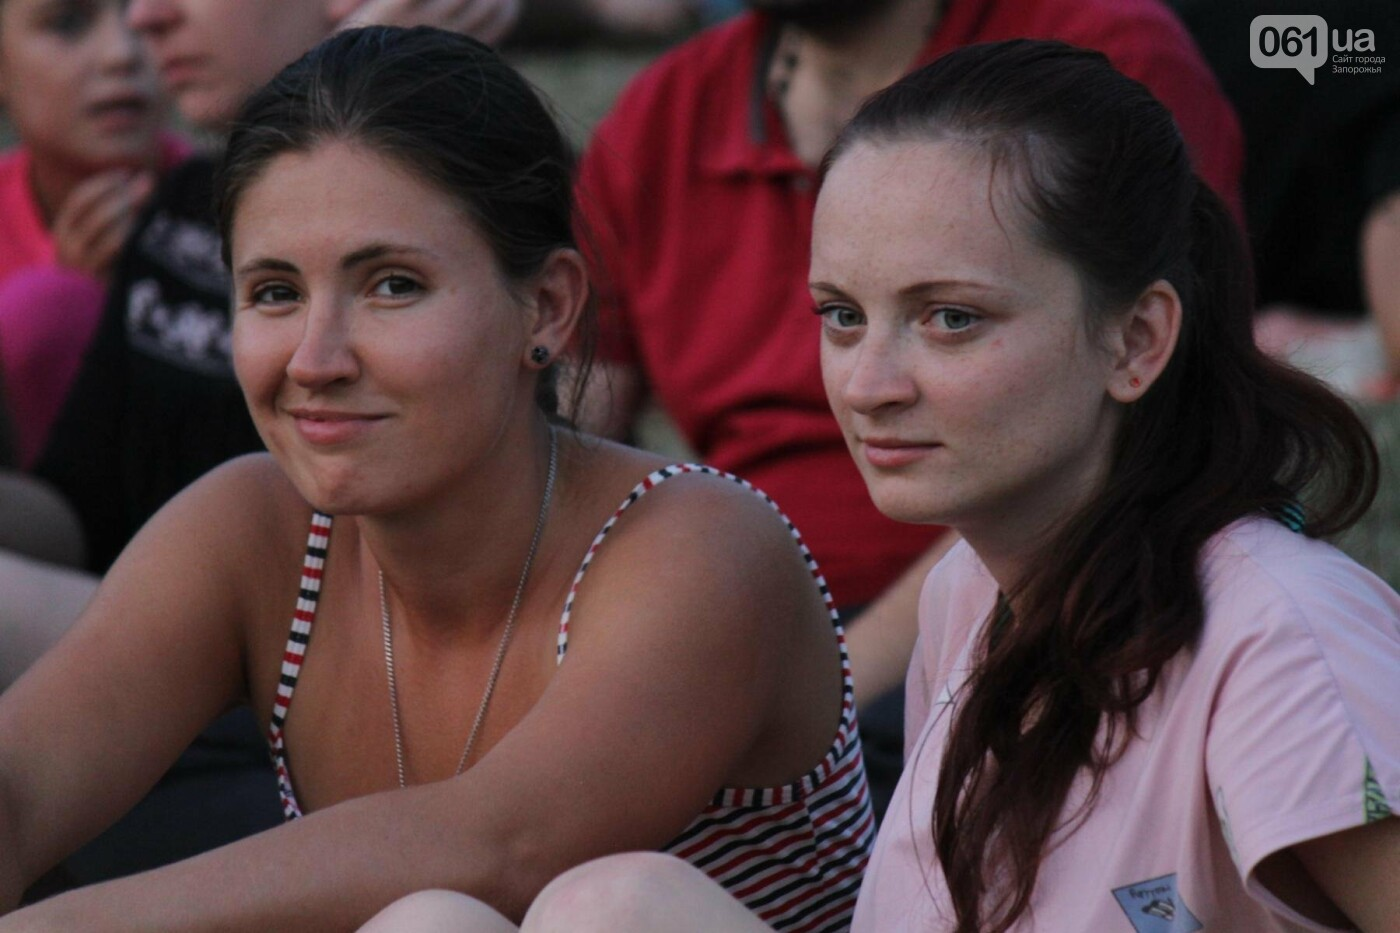 Найди себя: 50 портретов посетителей фестиваля Khortytsia Freedom, – ФОТОРЕПОРТАЖ, фото-35